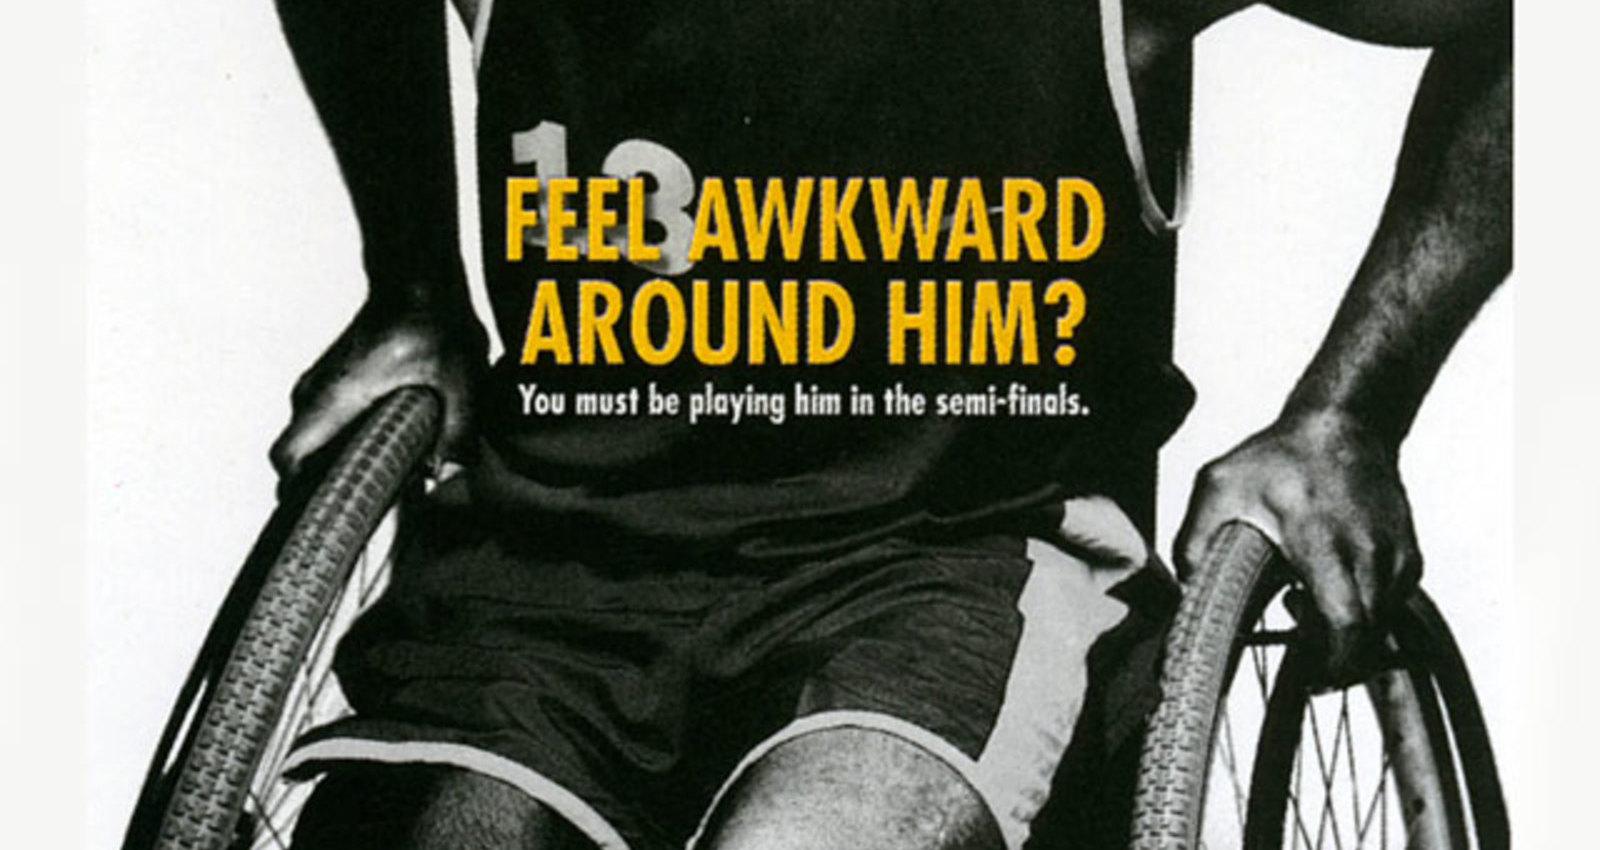 Nike Paralympics - Stare, Sorry, Awkward